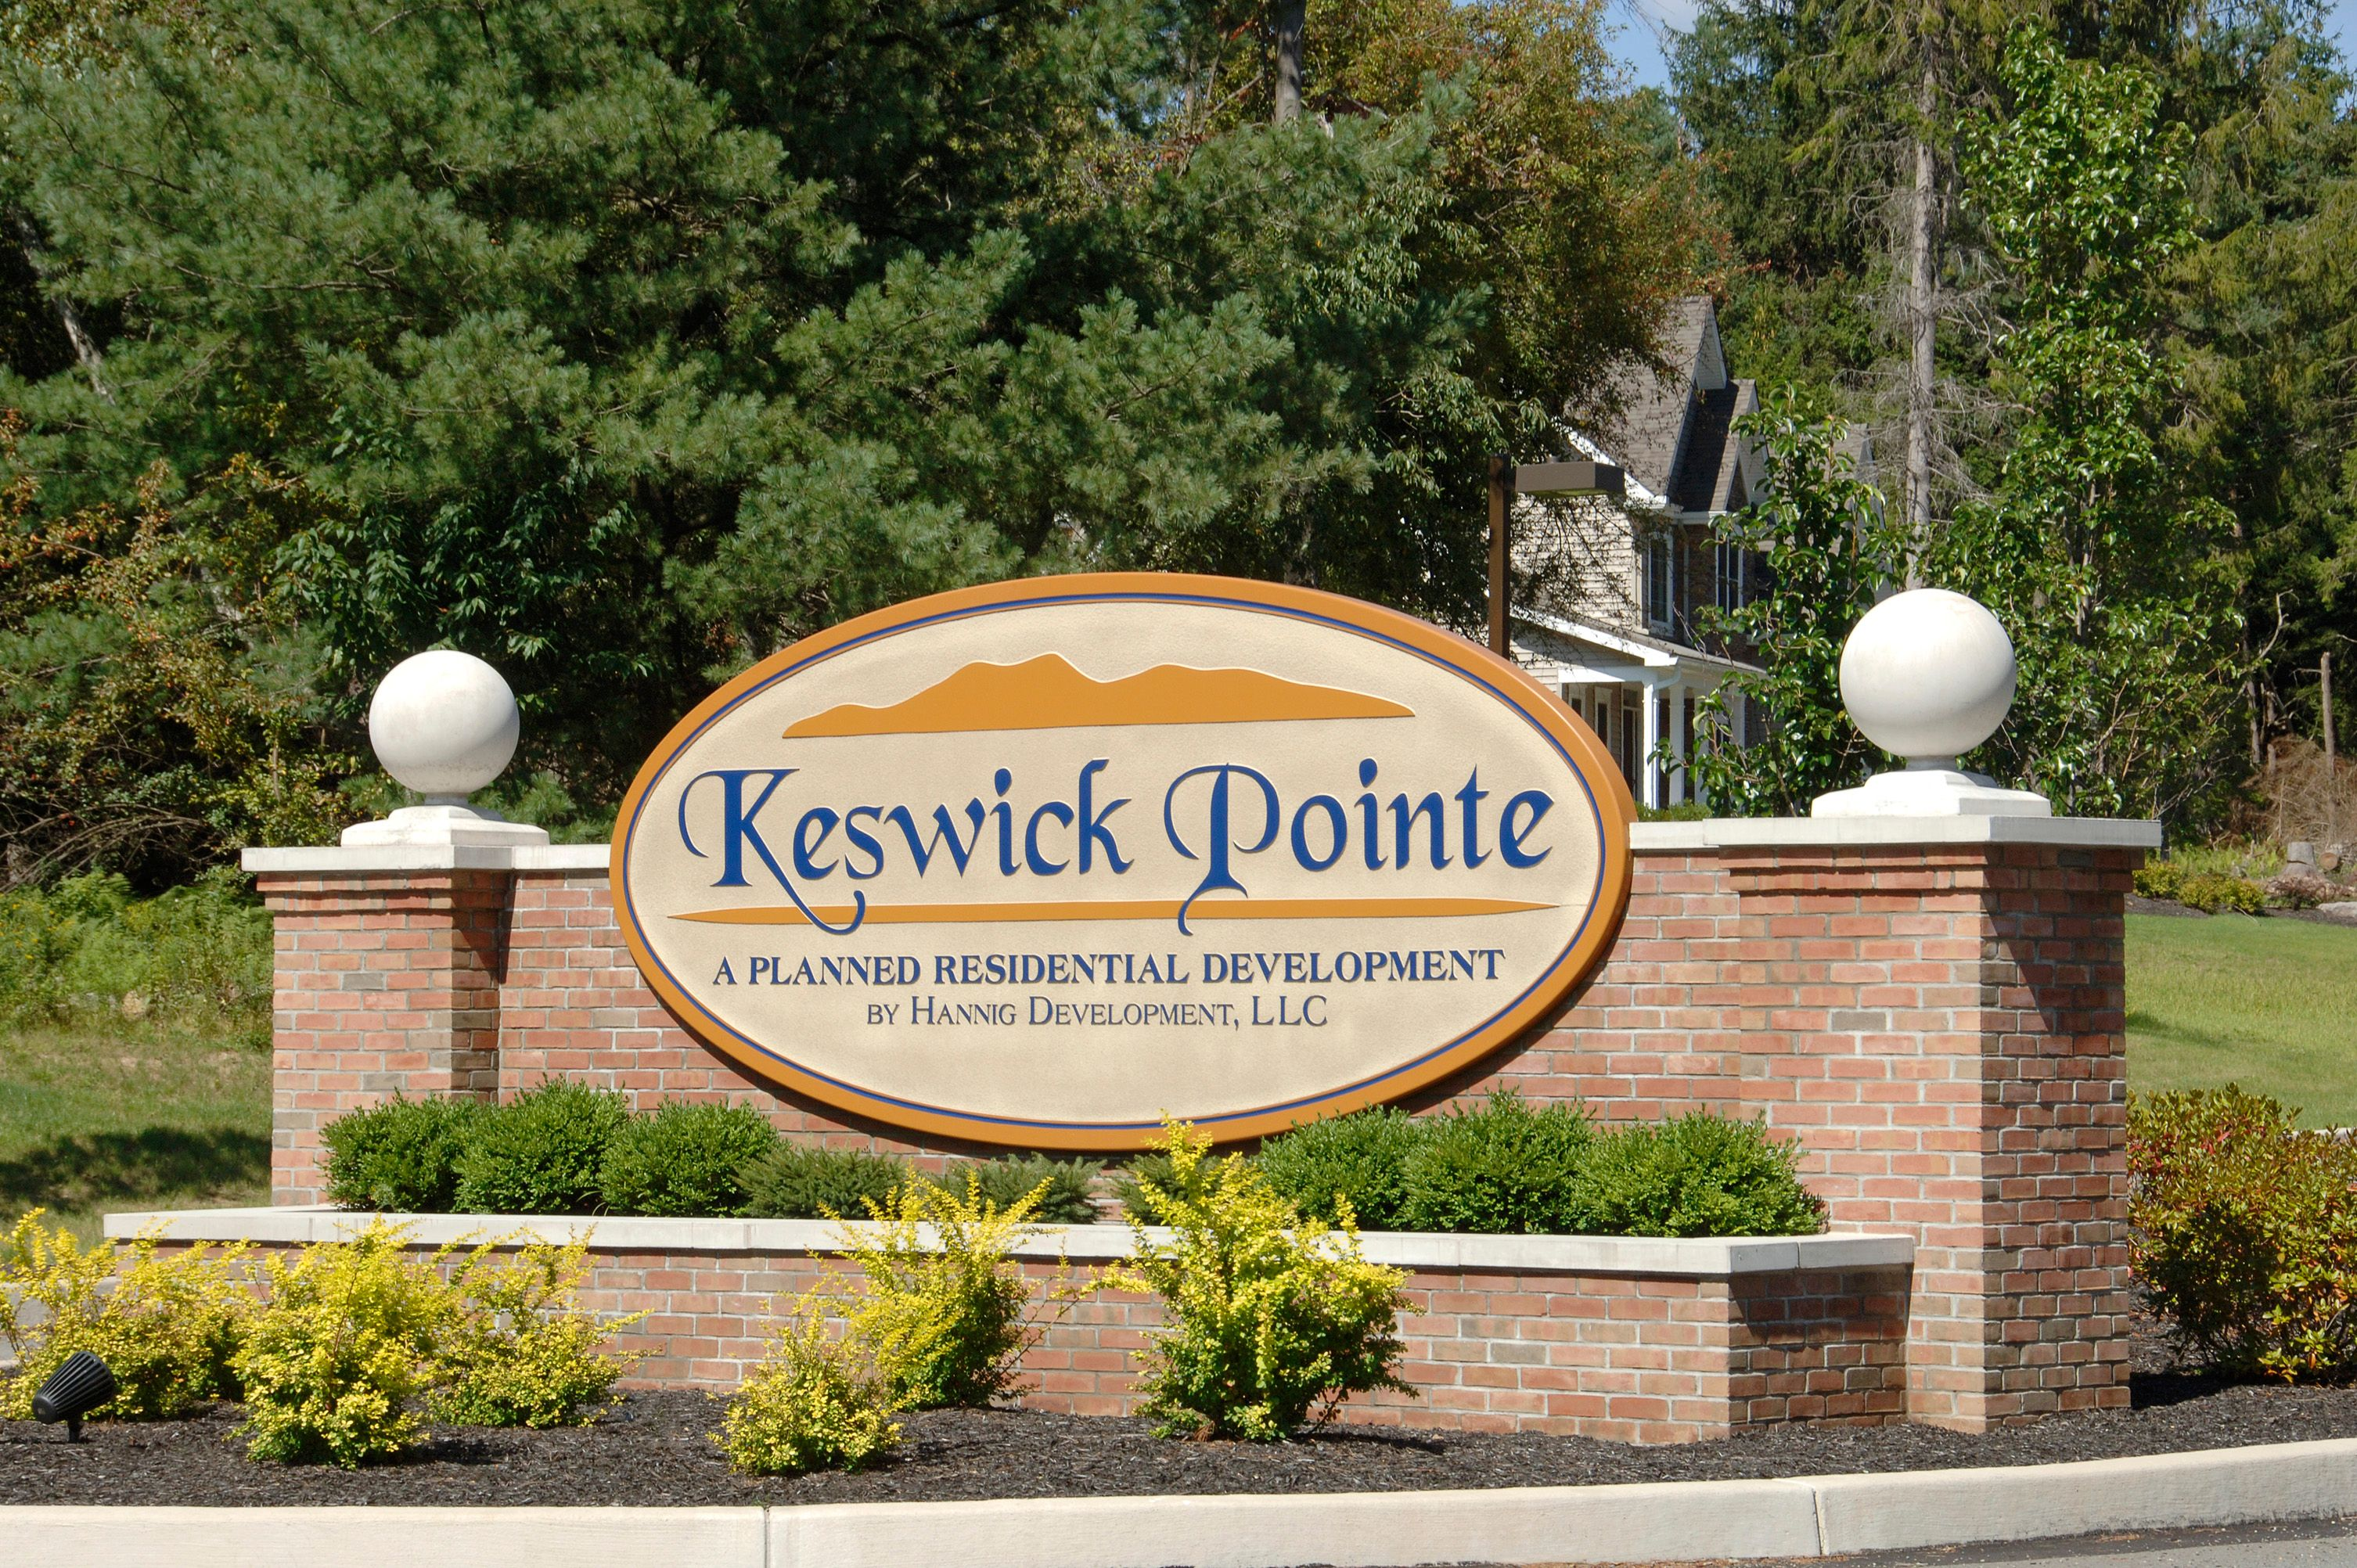 'Keswick Pointe' by Spread Eagle Development Corporation in Poconos